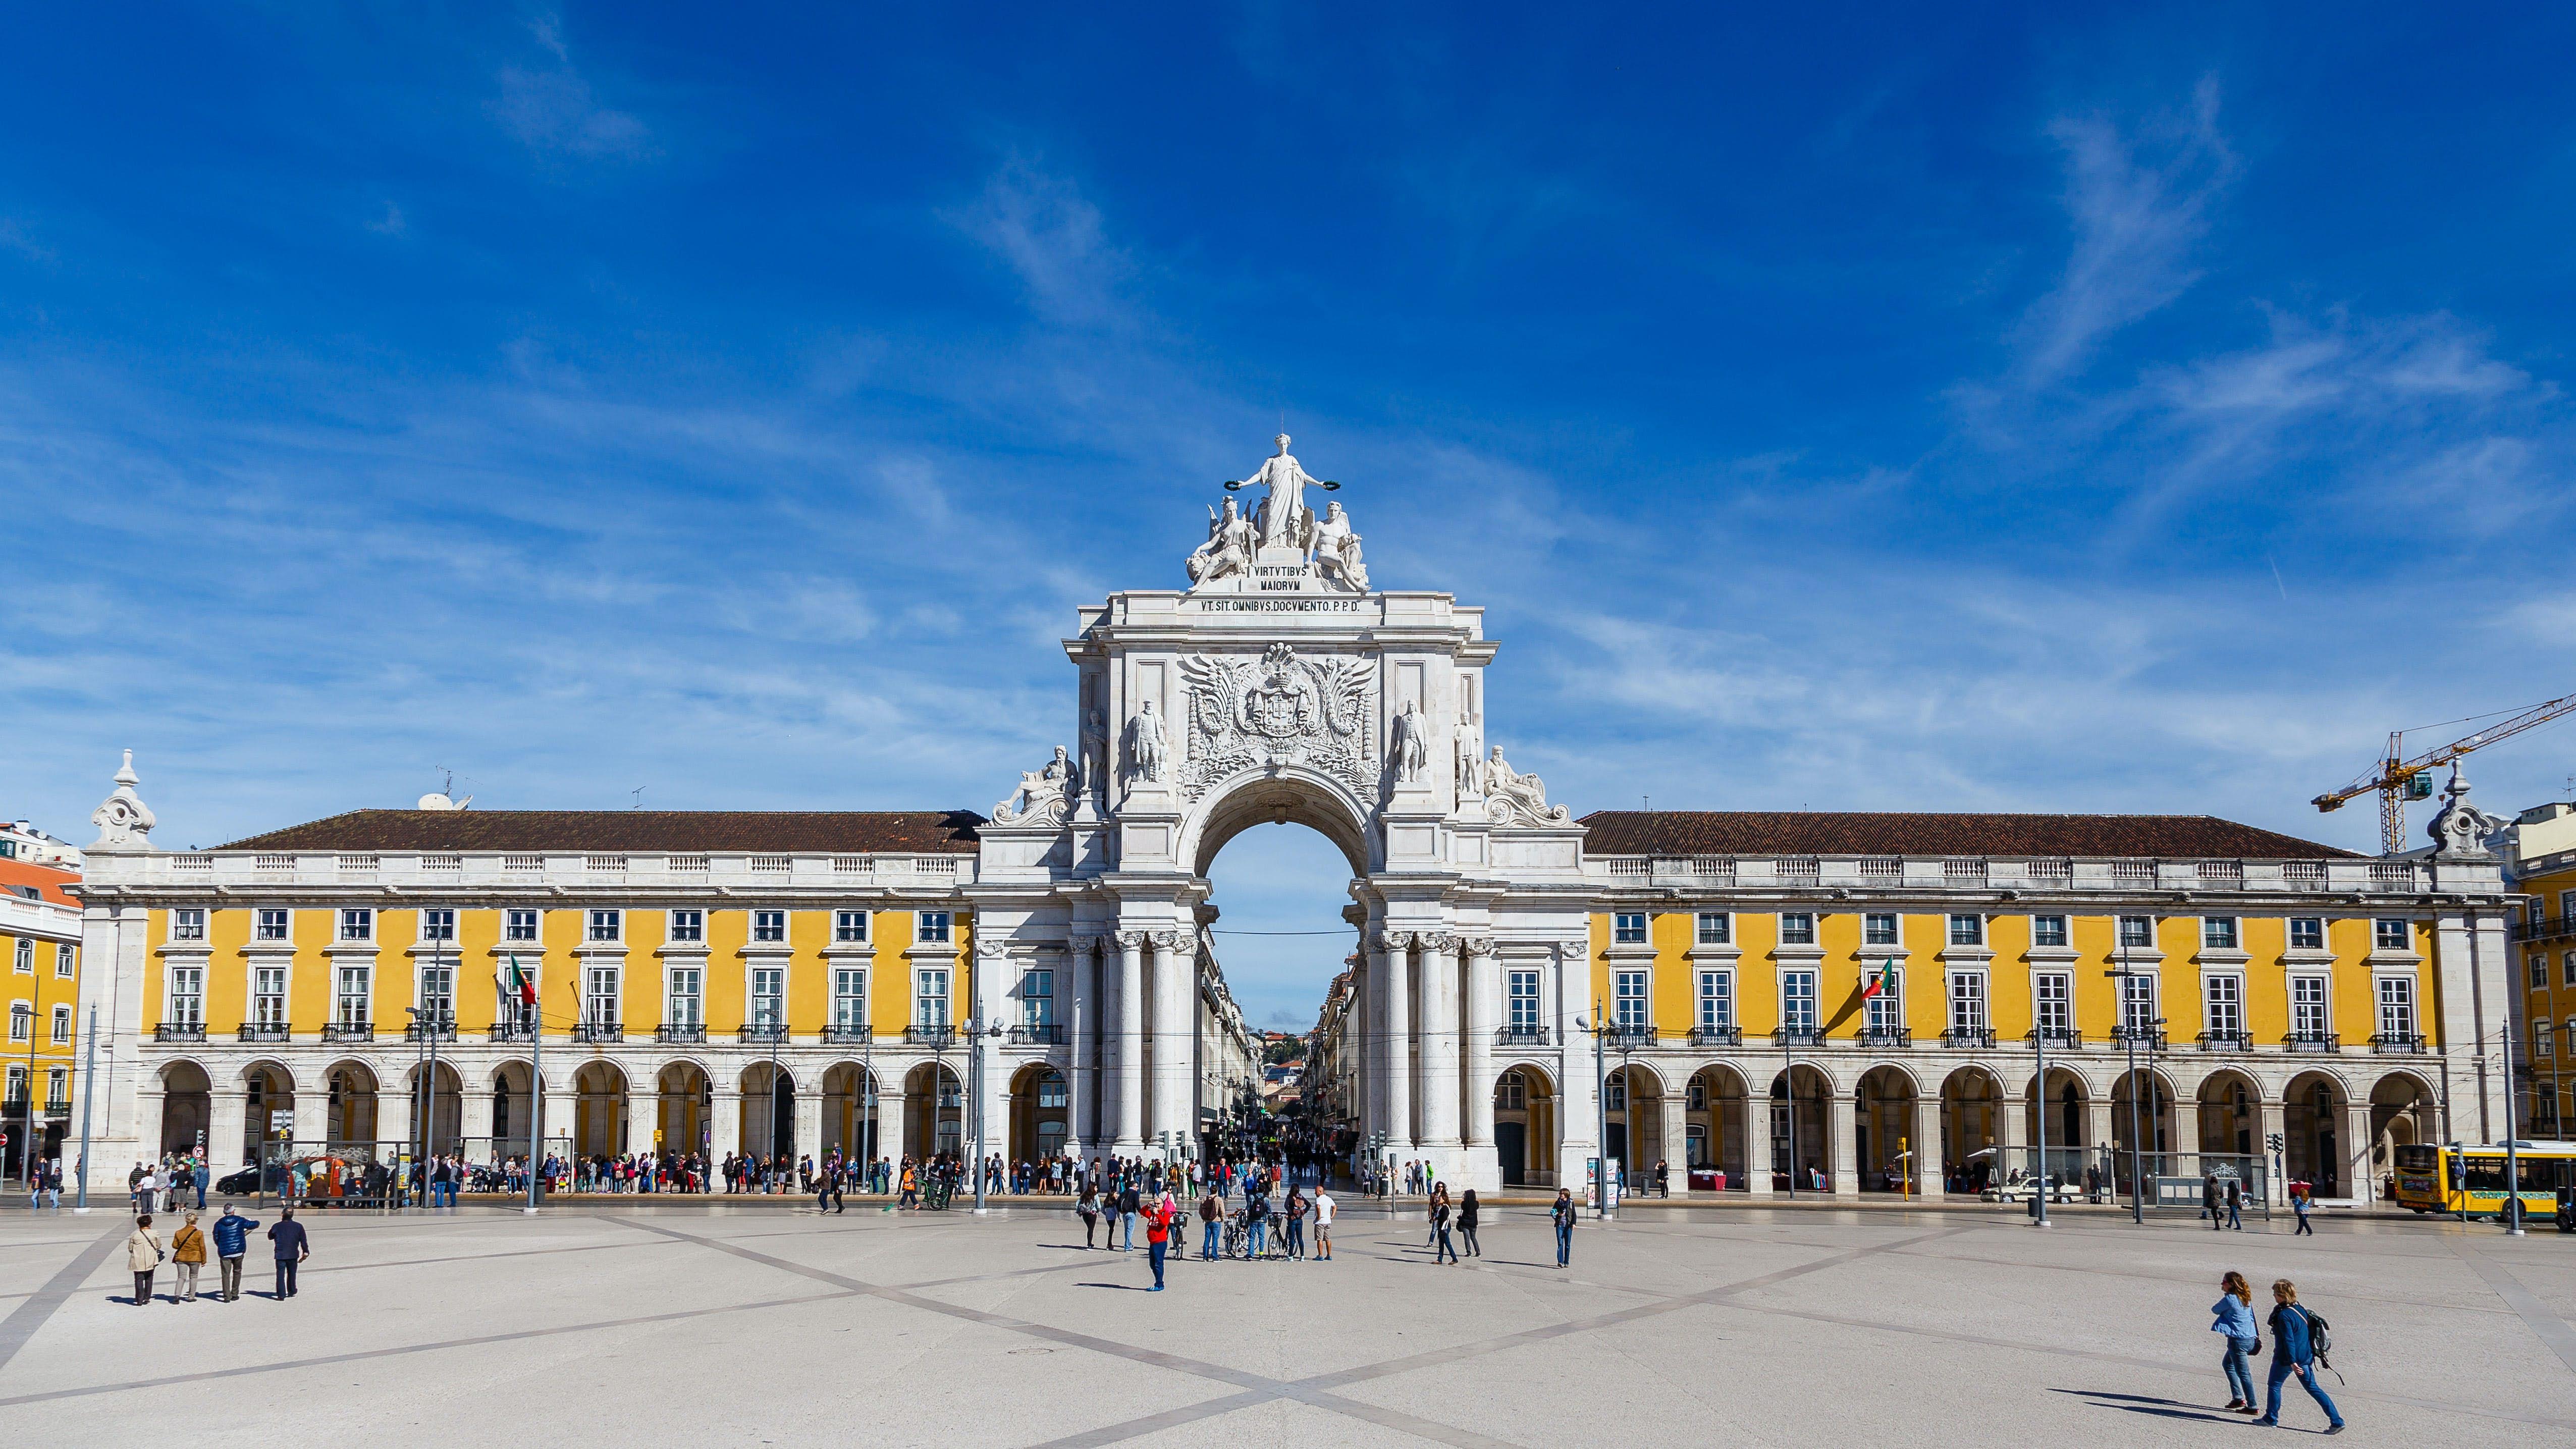 Praça do Comércio   Lisbon, Portugal Attractions - Lonely Planet